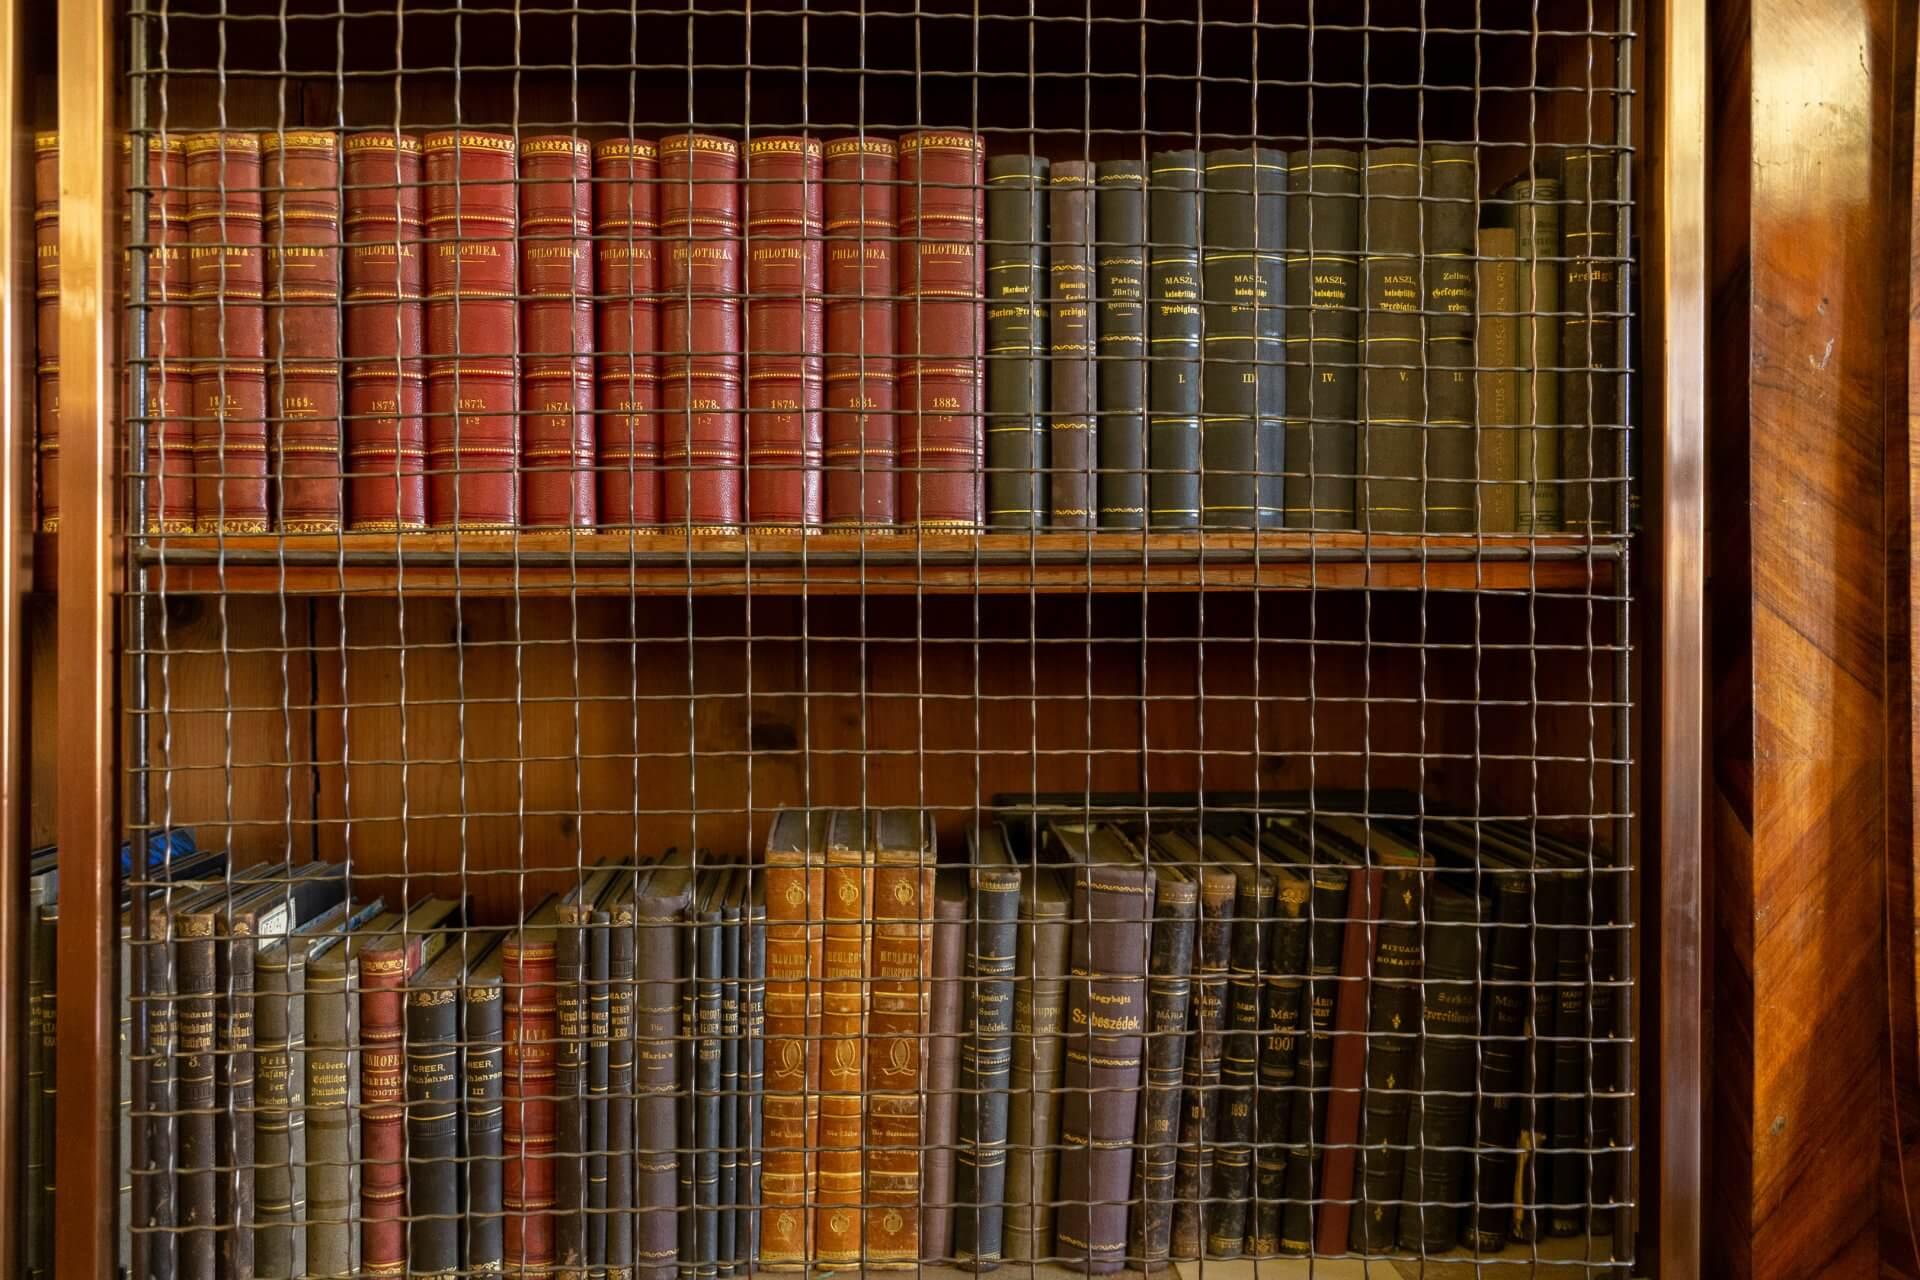 In der Bibliothek im Barockzimmer (Barokk térem) im Hotel Klastrum Győr